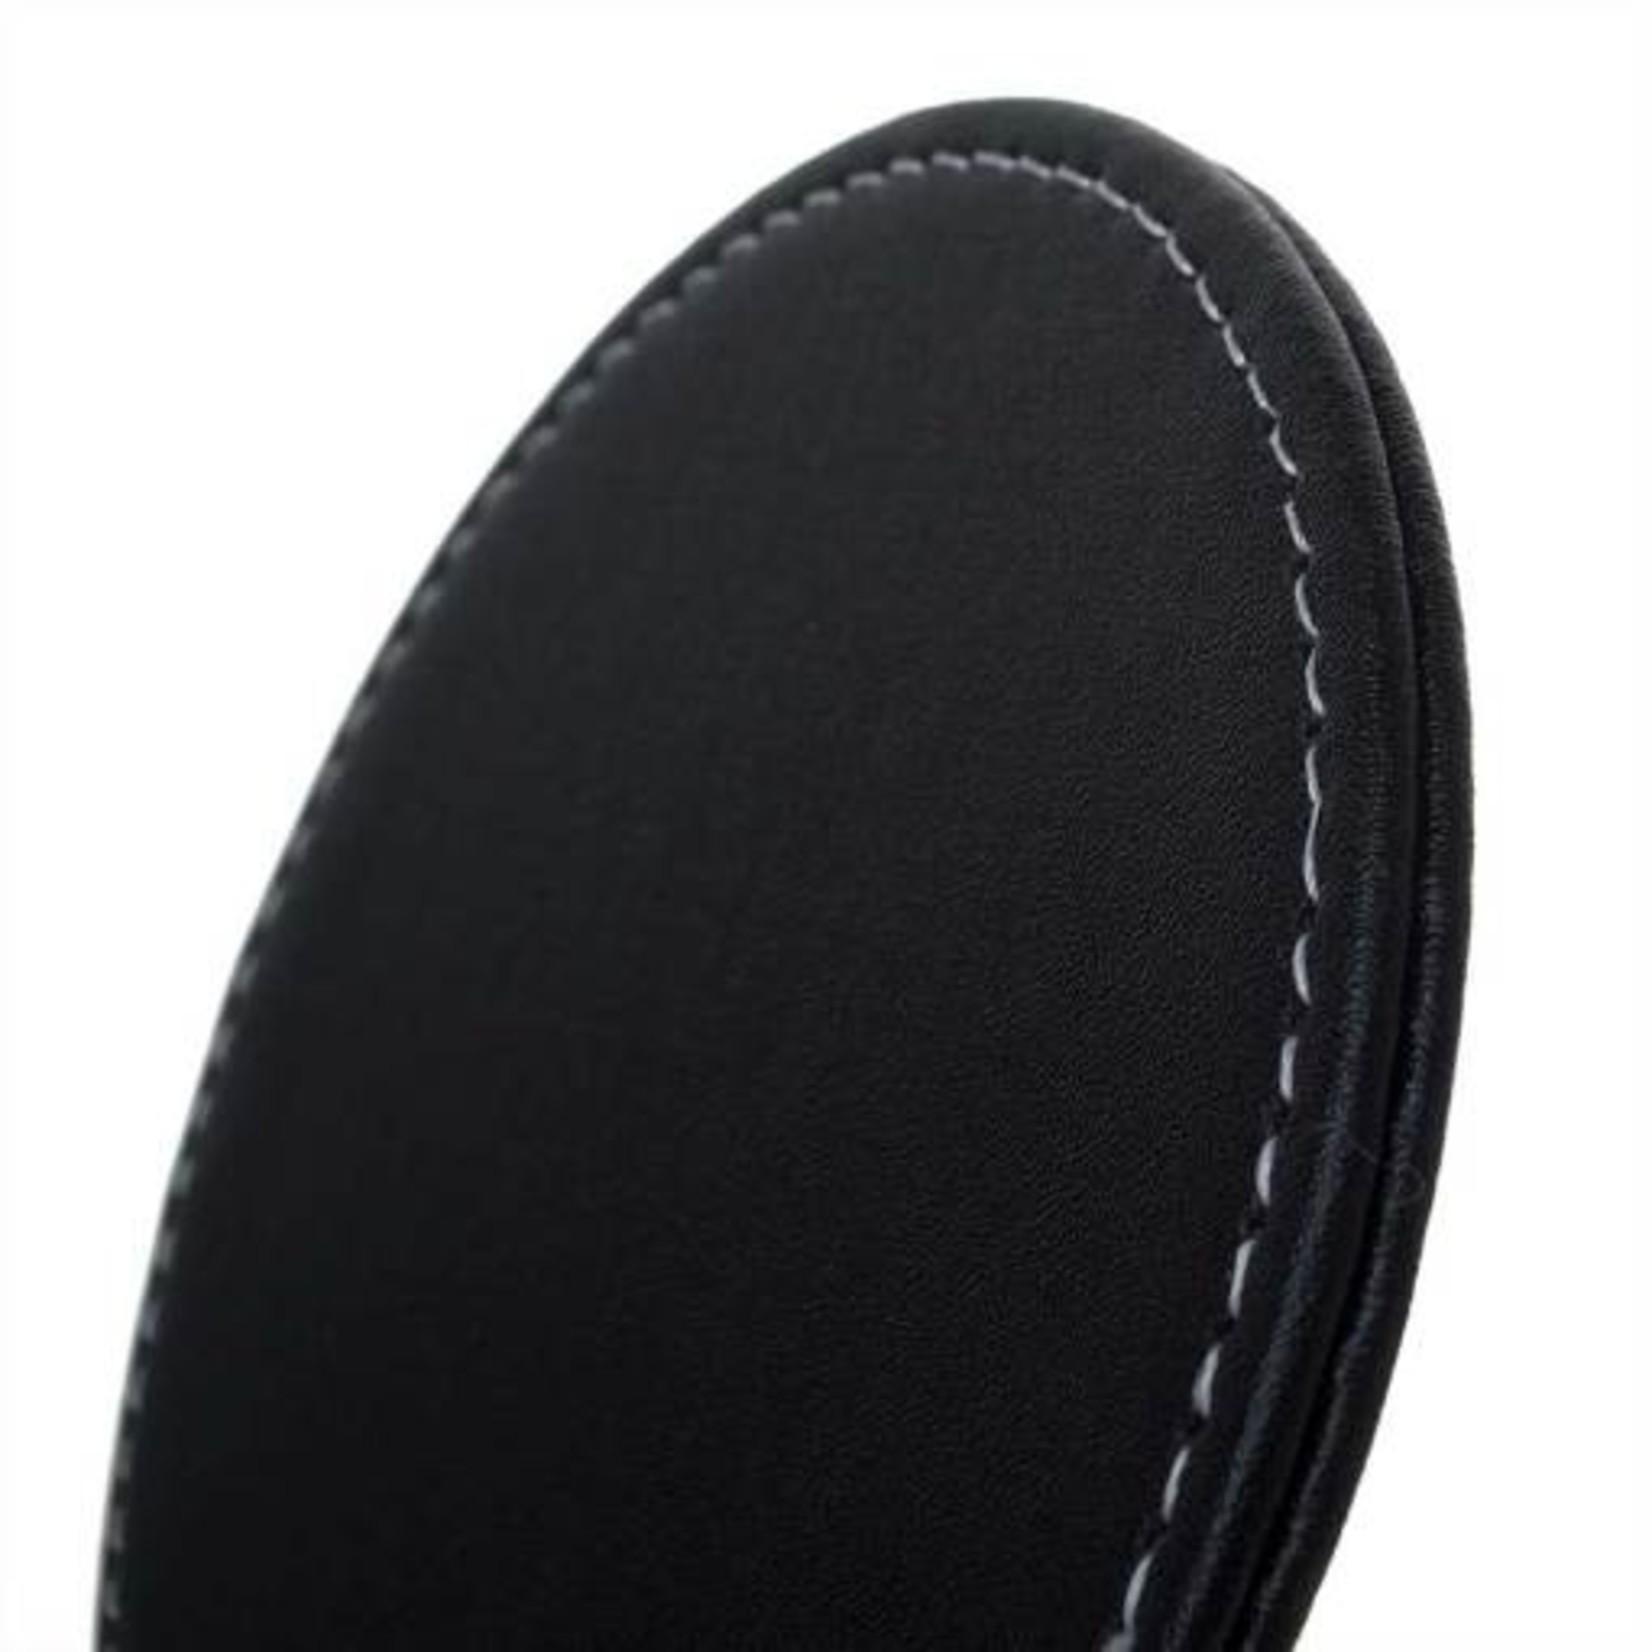 Modern Drunkard Atomic Drunkard Black Leatherette Coasters